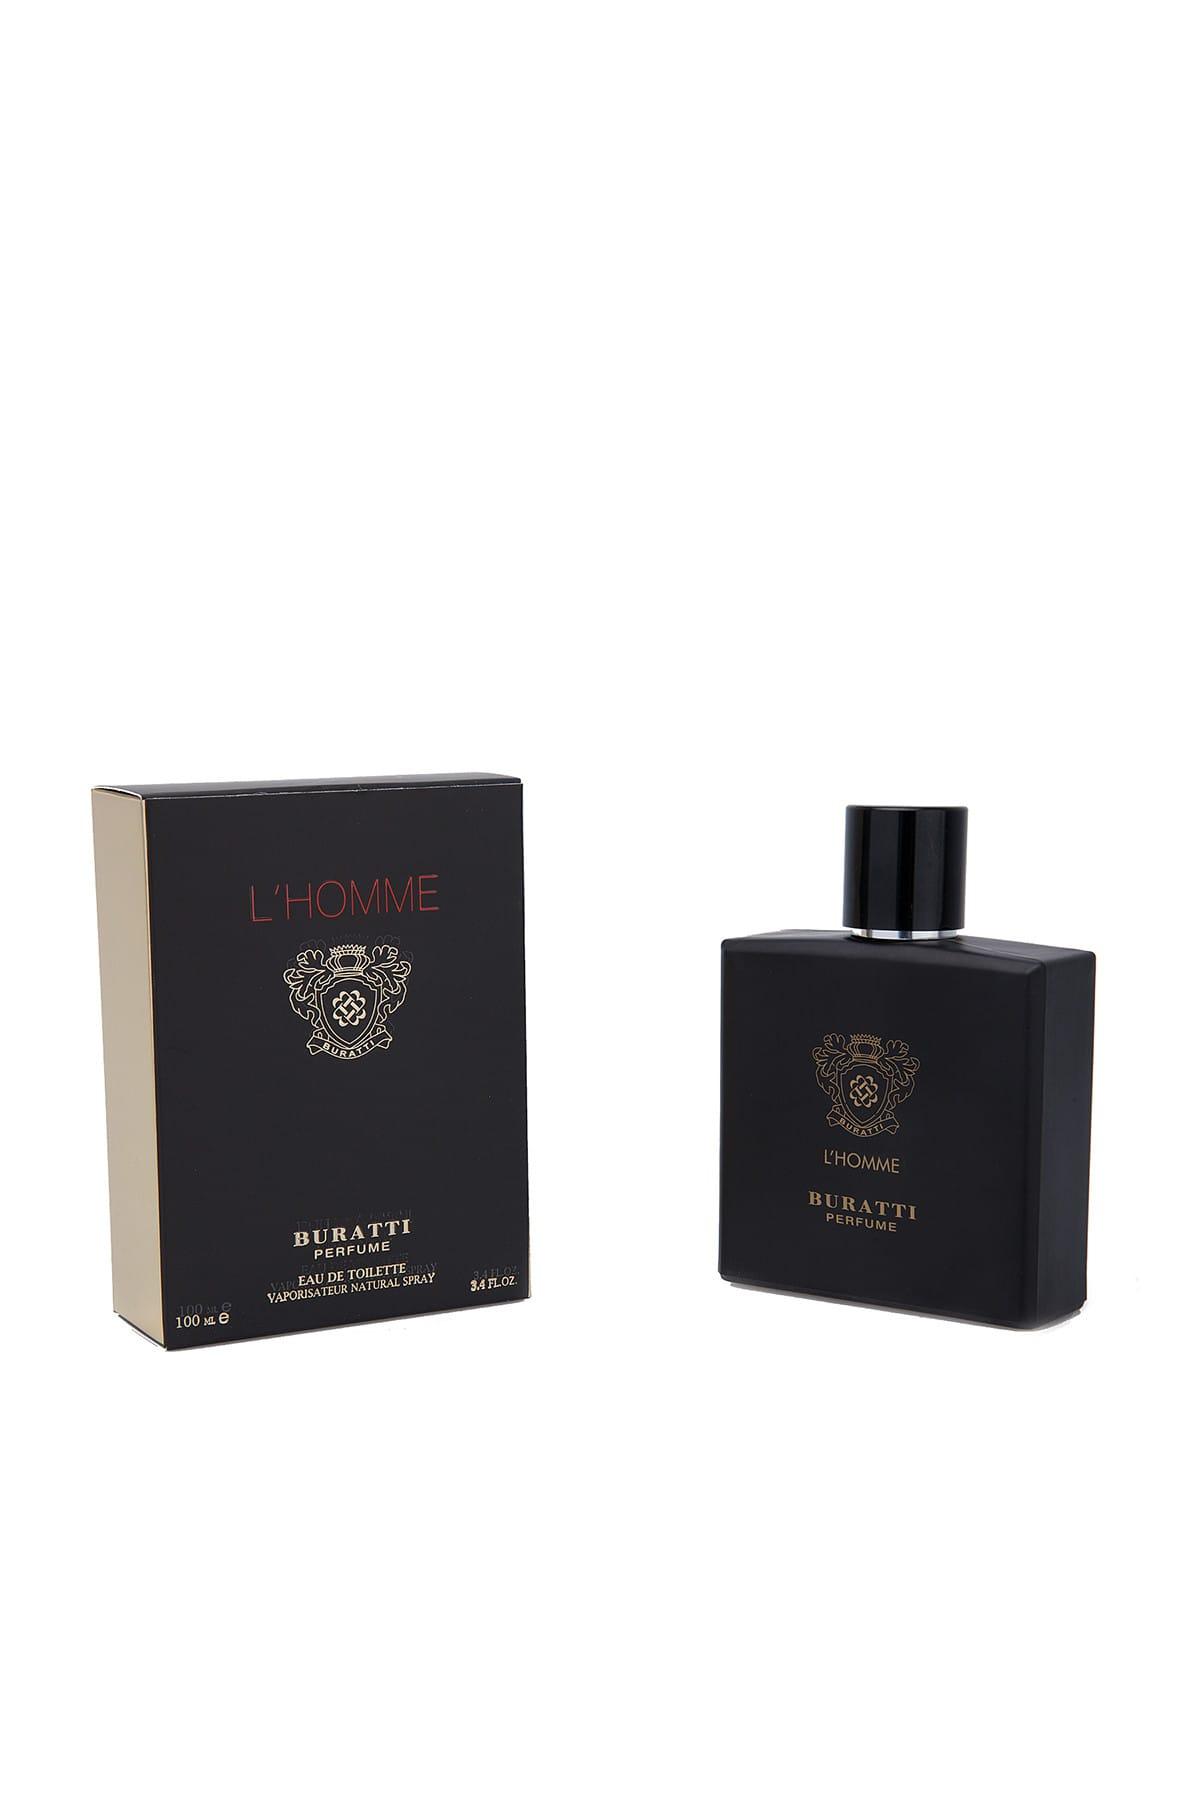 Buratti Erkek Edt 100 ml Parfüm 509LHOMME 1